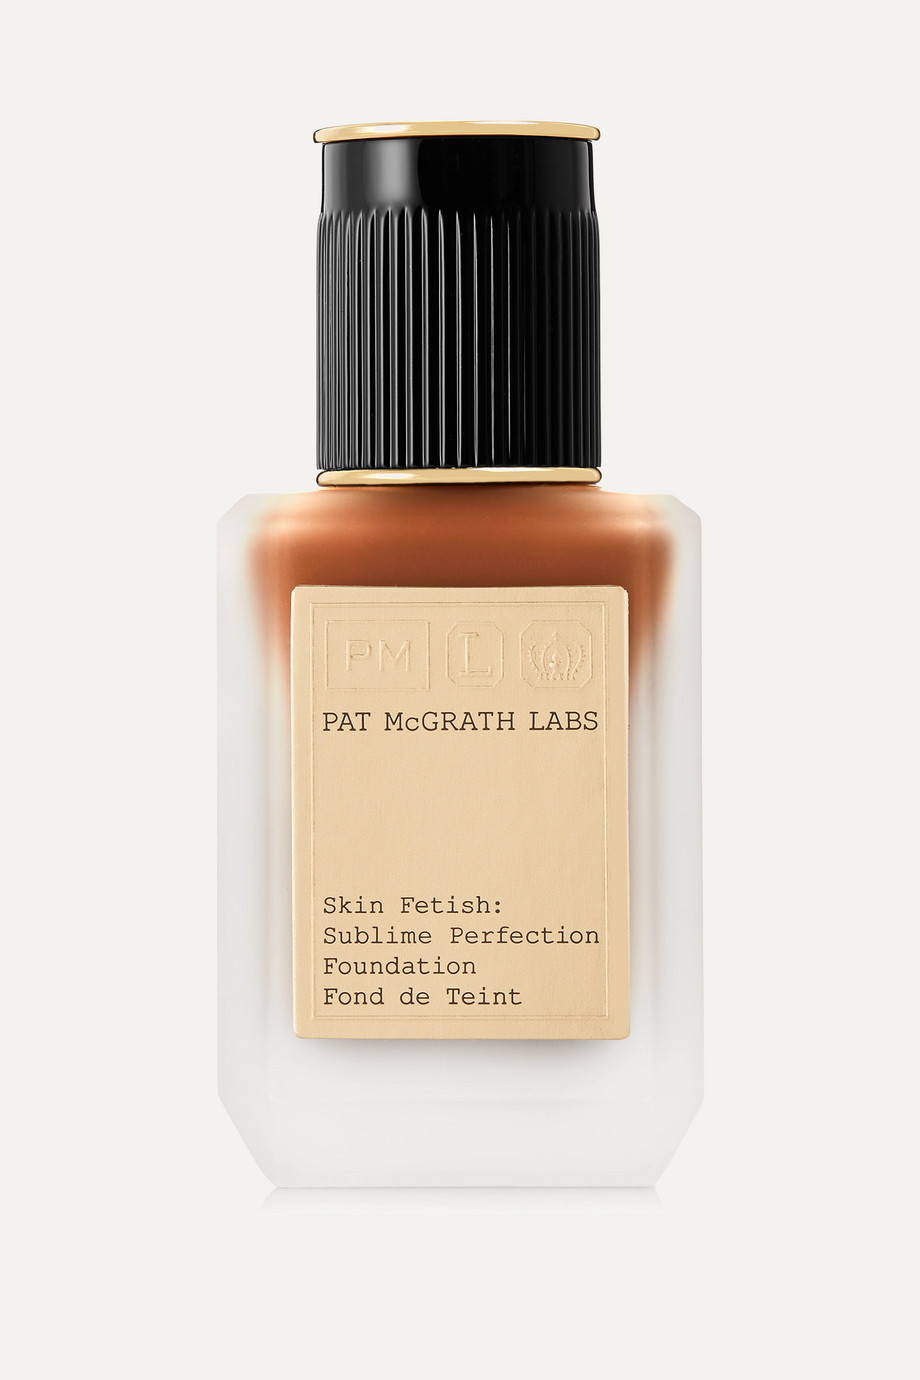 Pat McGrath Labs Skin Fetish: Sublime Perfection Foundation - Medium Deep 28, 35ml